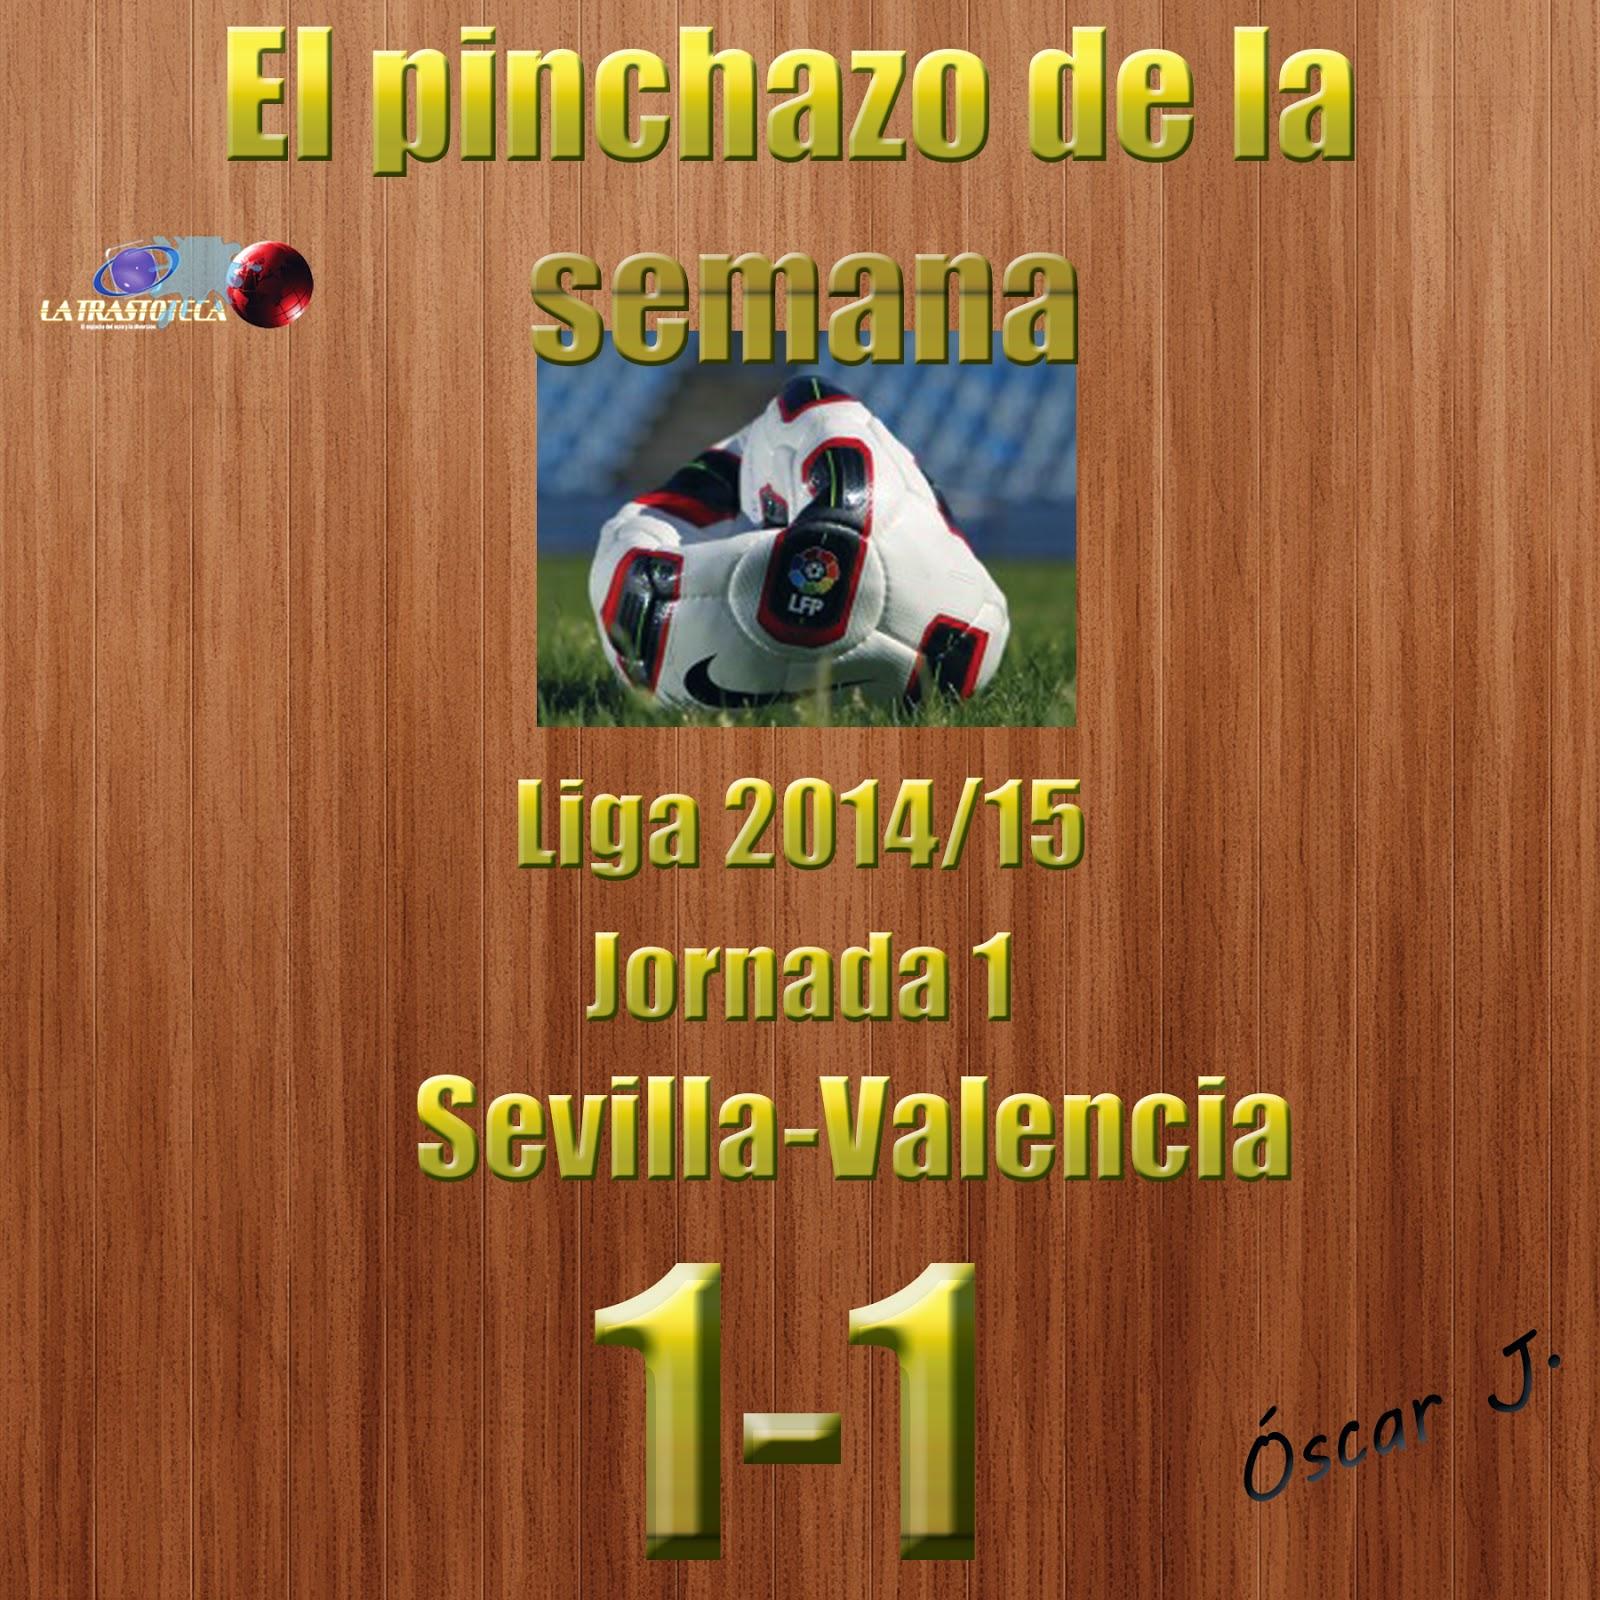 Sevilla 1-1 Valencia. Liga 2014/15 - Jornada 1. El pinchazo de la semana.